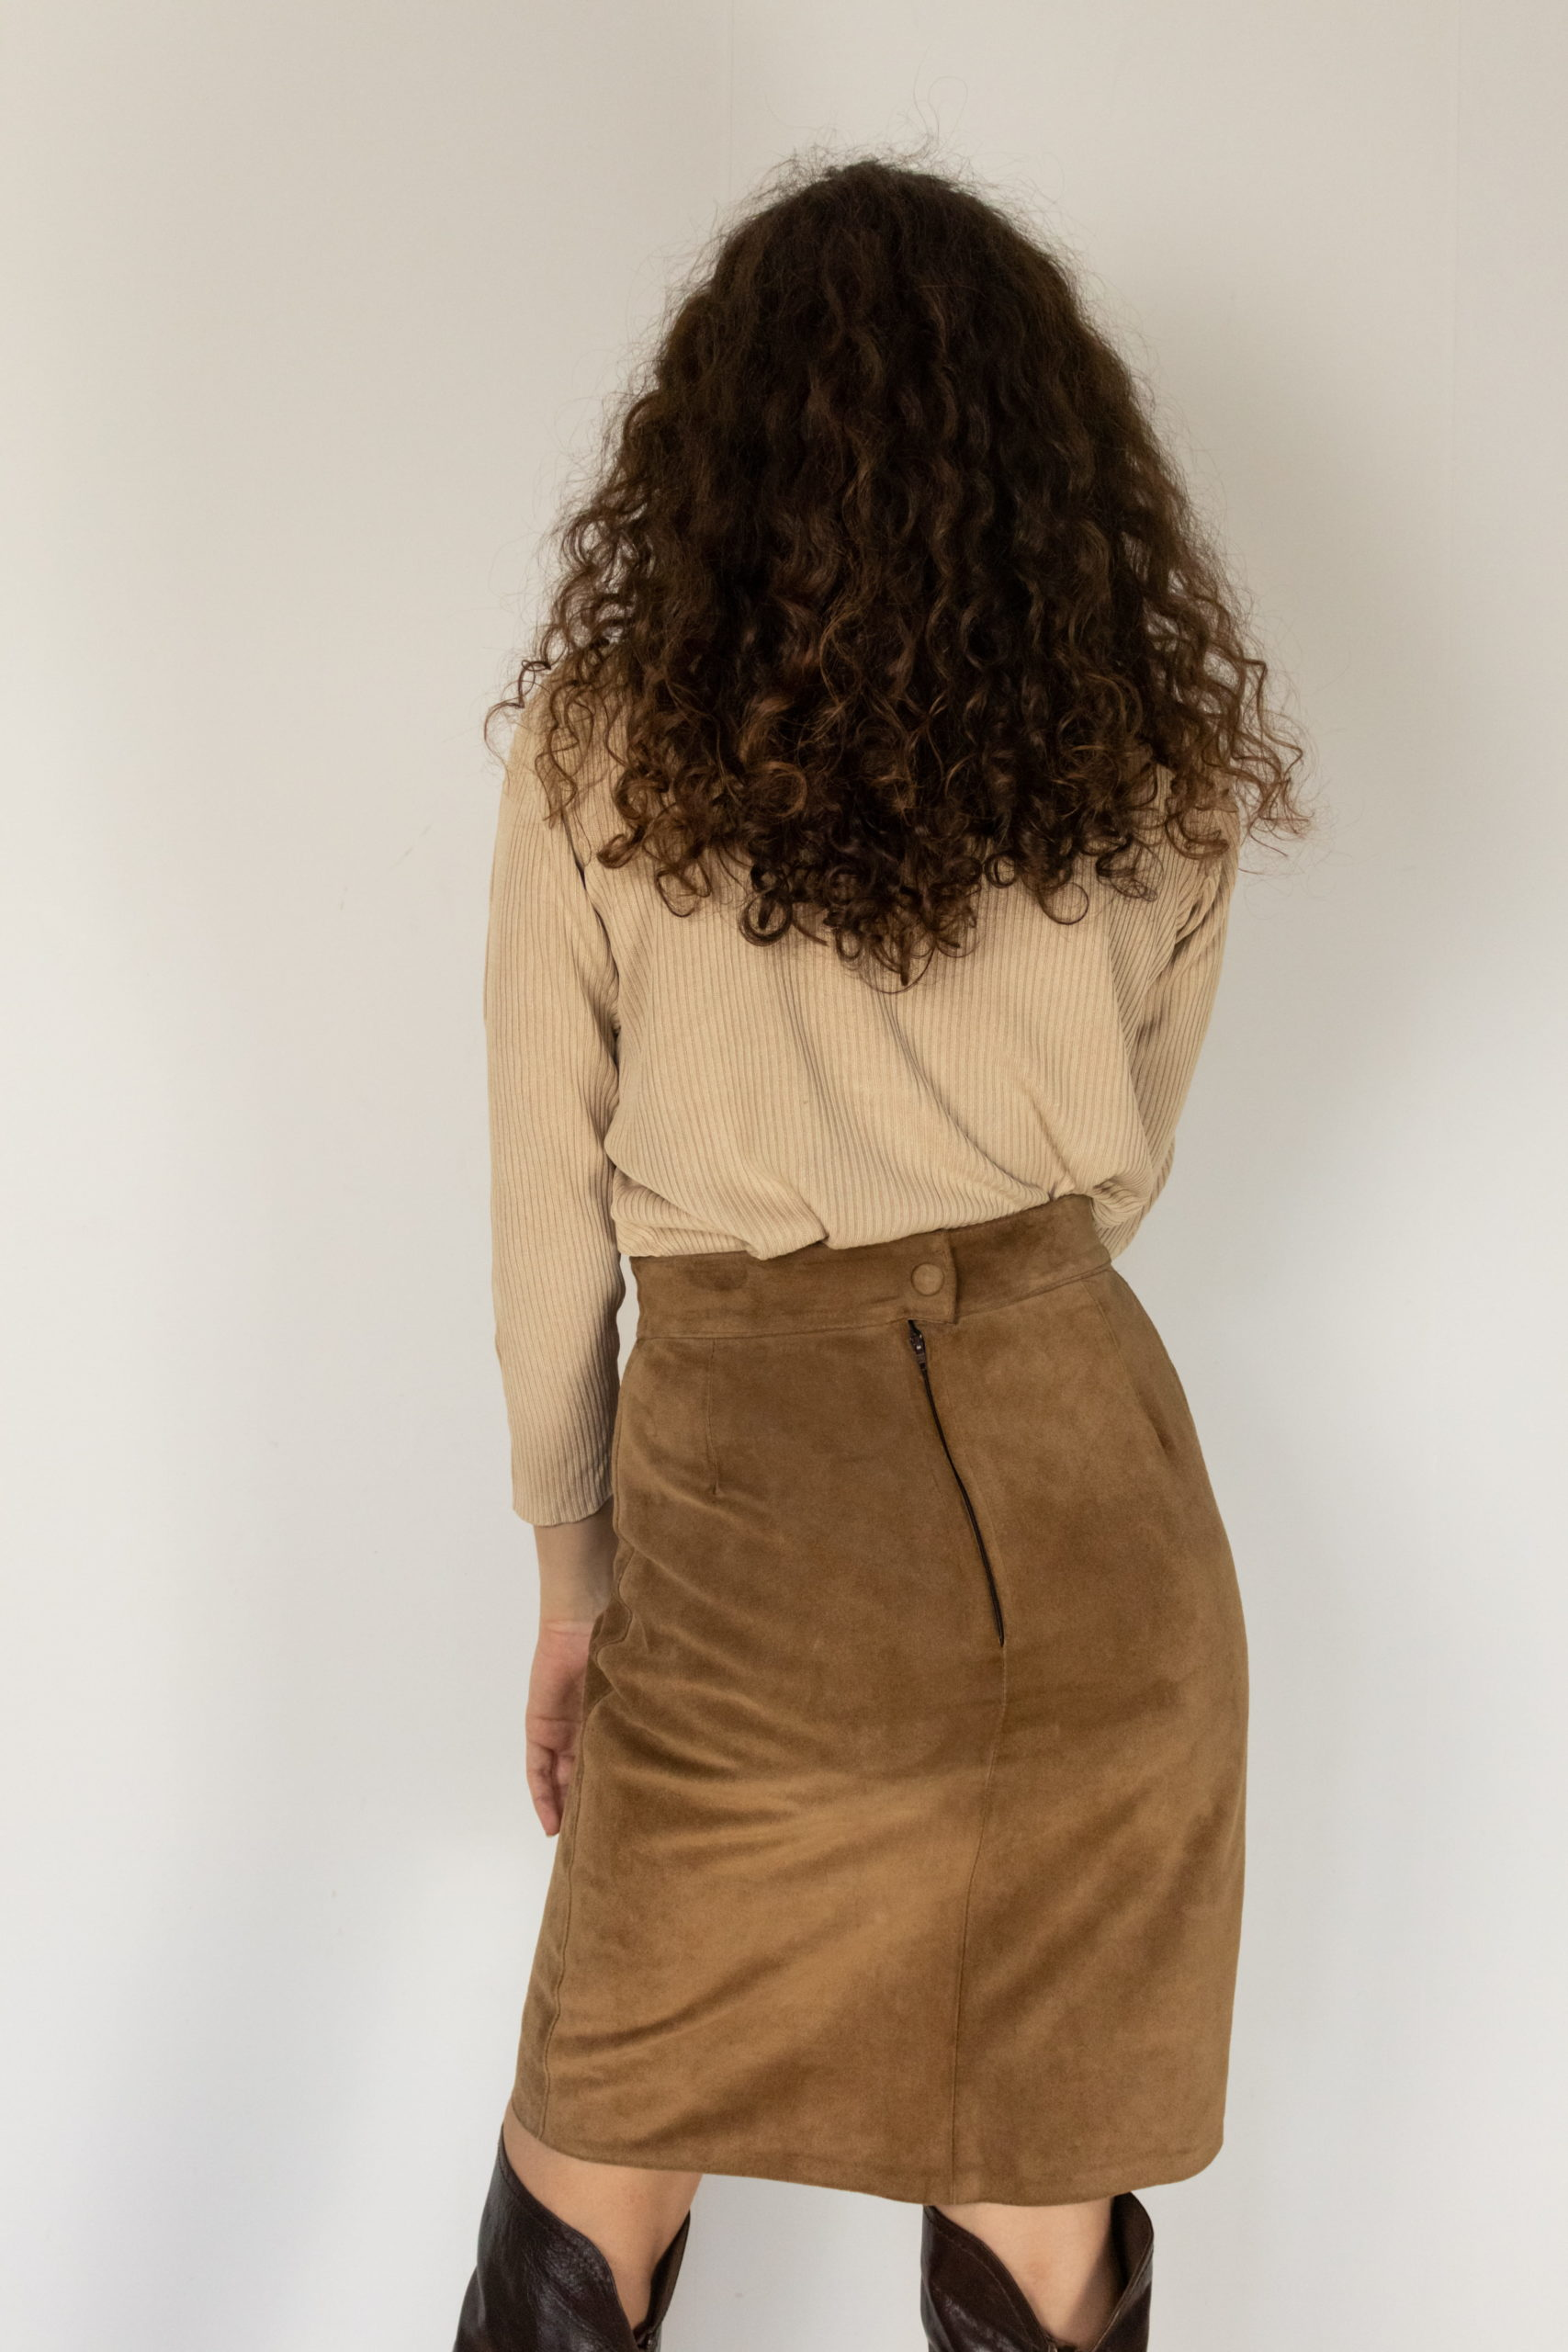 jupe marron en daim (3)